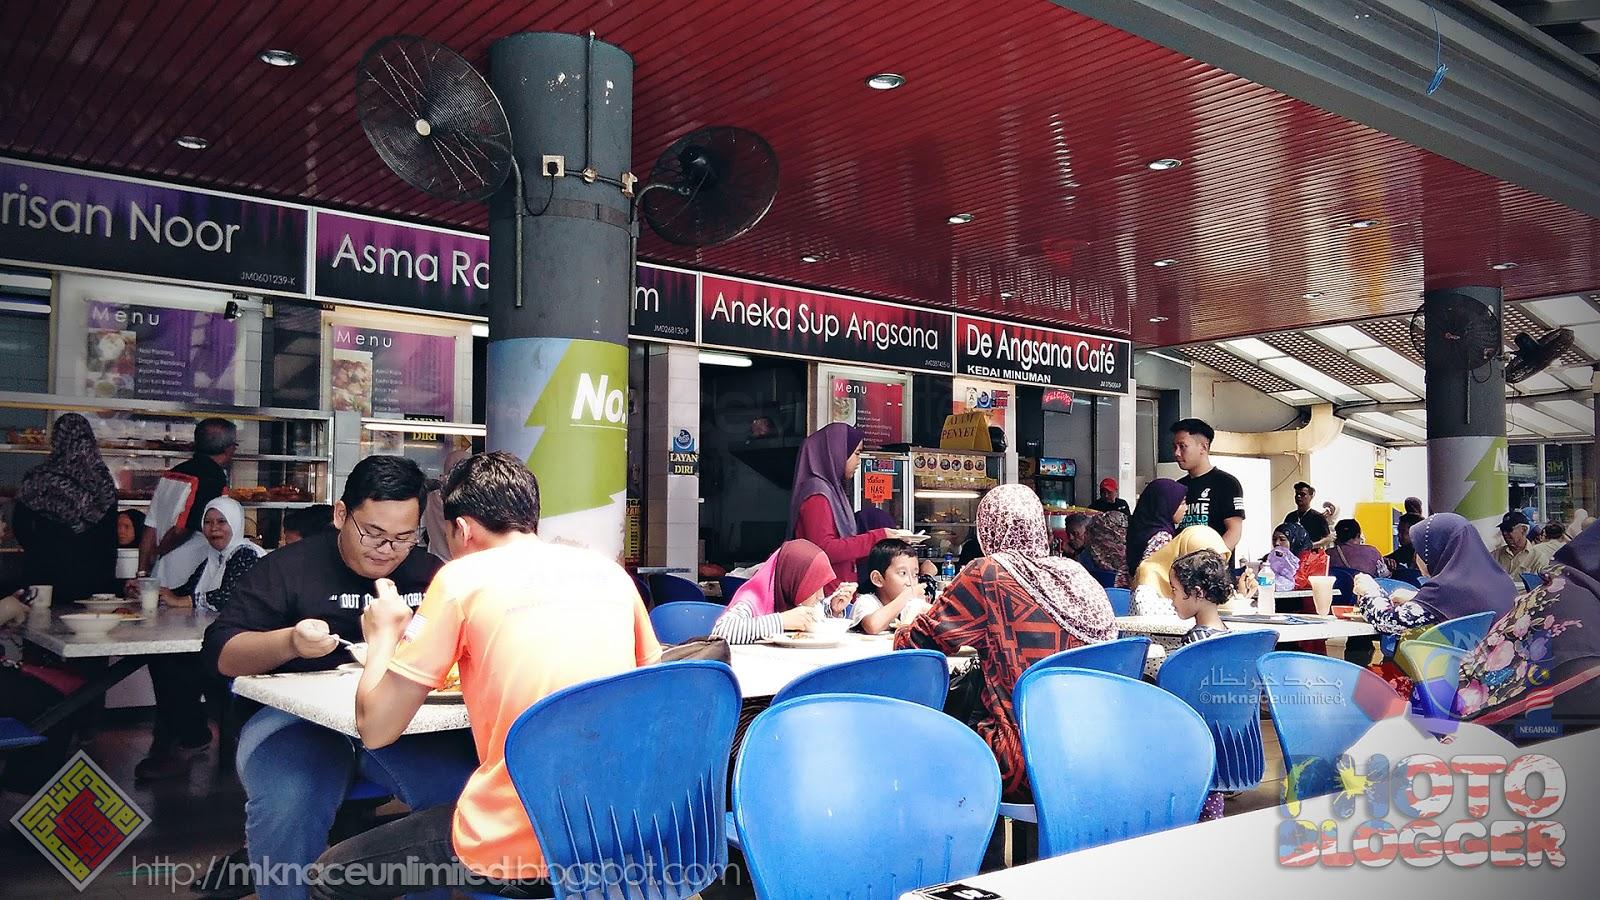 Jenjalan Cari Makan Plaza Angsana Johor Bahru Mknace Unlimited Tcash Vaganza 32 Milo Malaysia Activ Go The Colours Of Life